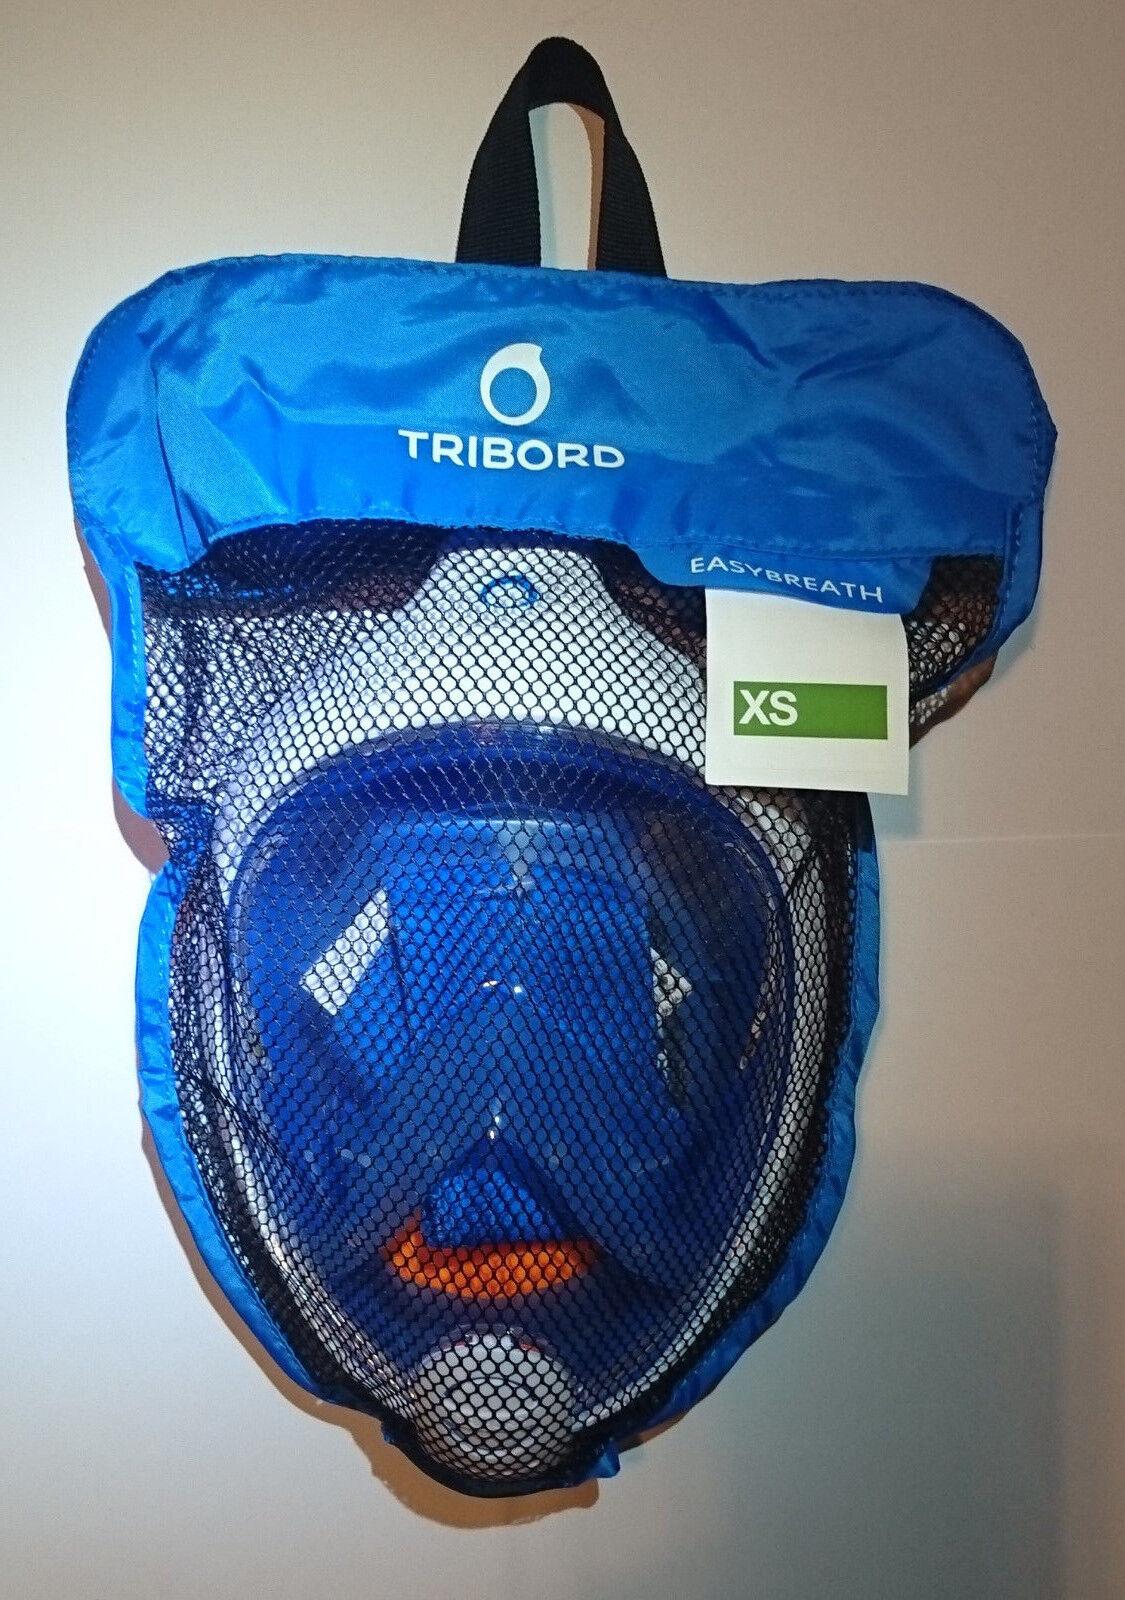 как выглядит THE ORIGINAL Tribord Easybreath Snorkeling Mask, BLUE size XS, NEW, PERFECT фото